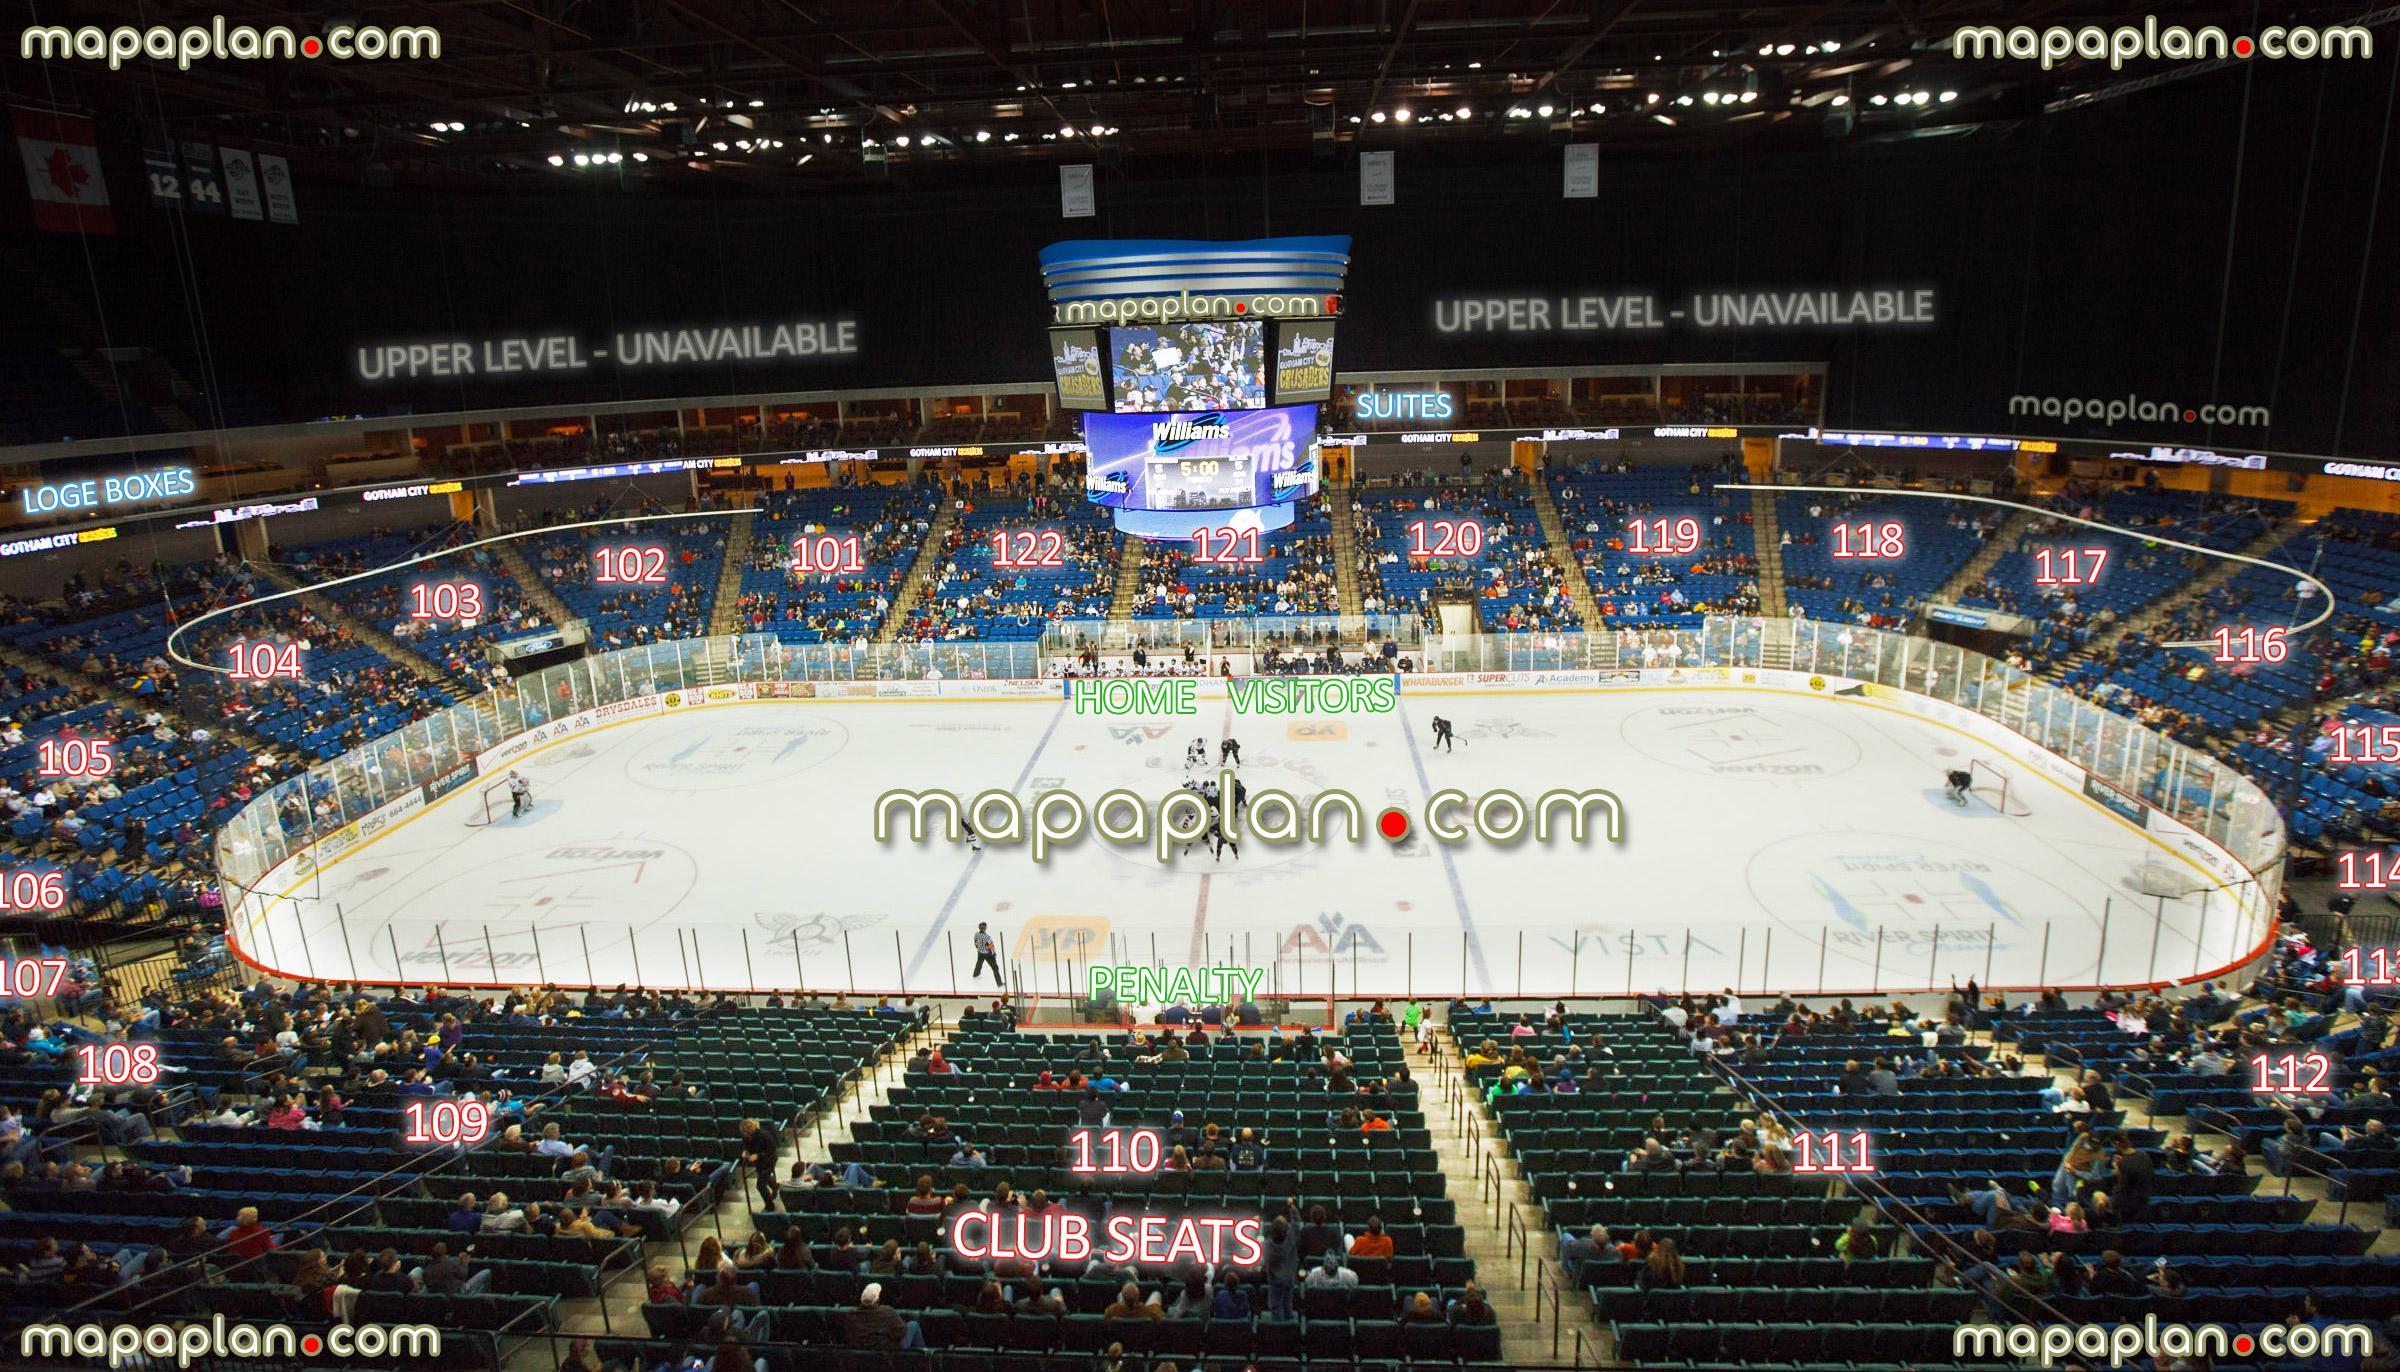 Tulsa Oilers Seating Chart  Bobi.karikaturize with regard to Bok Center Seating Chart